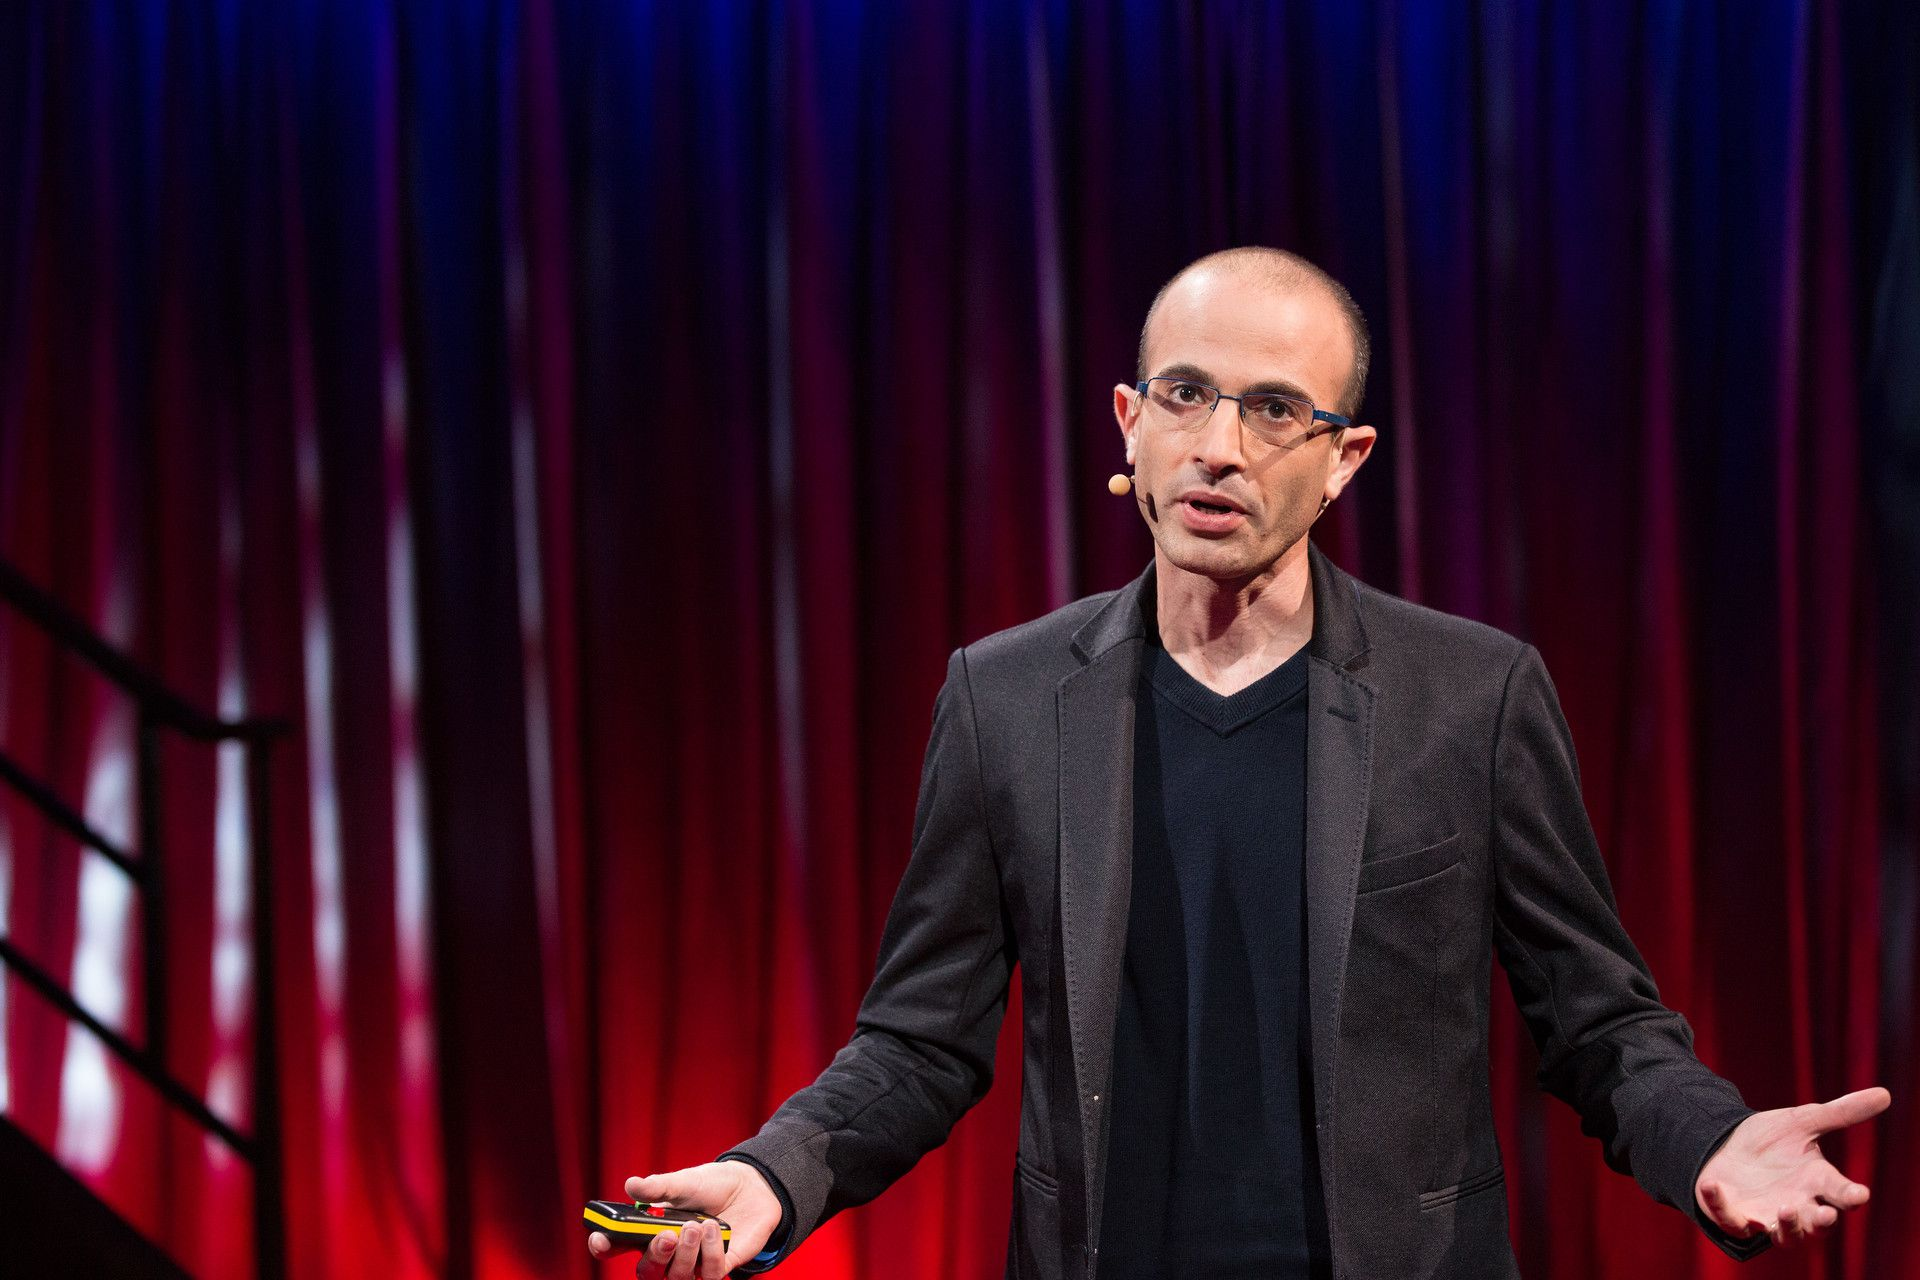 O perfil do professor e historiador Yuval Noah Harari